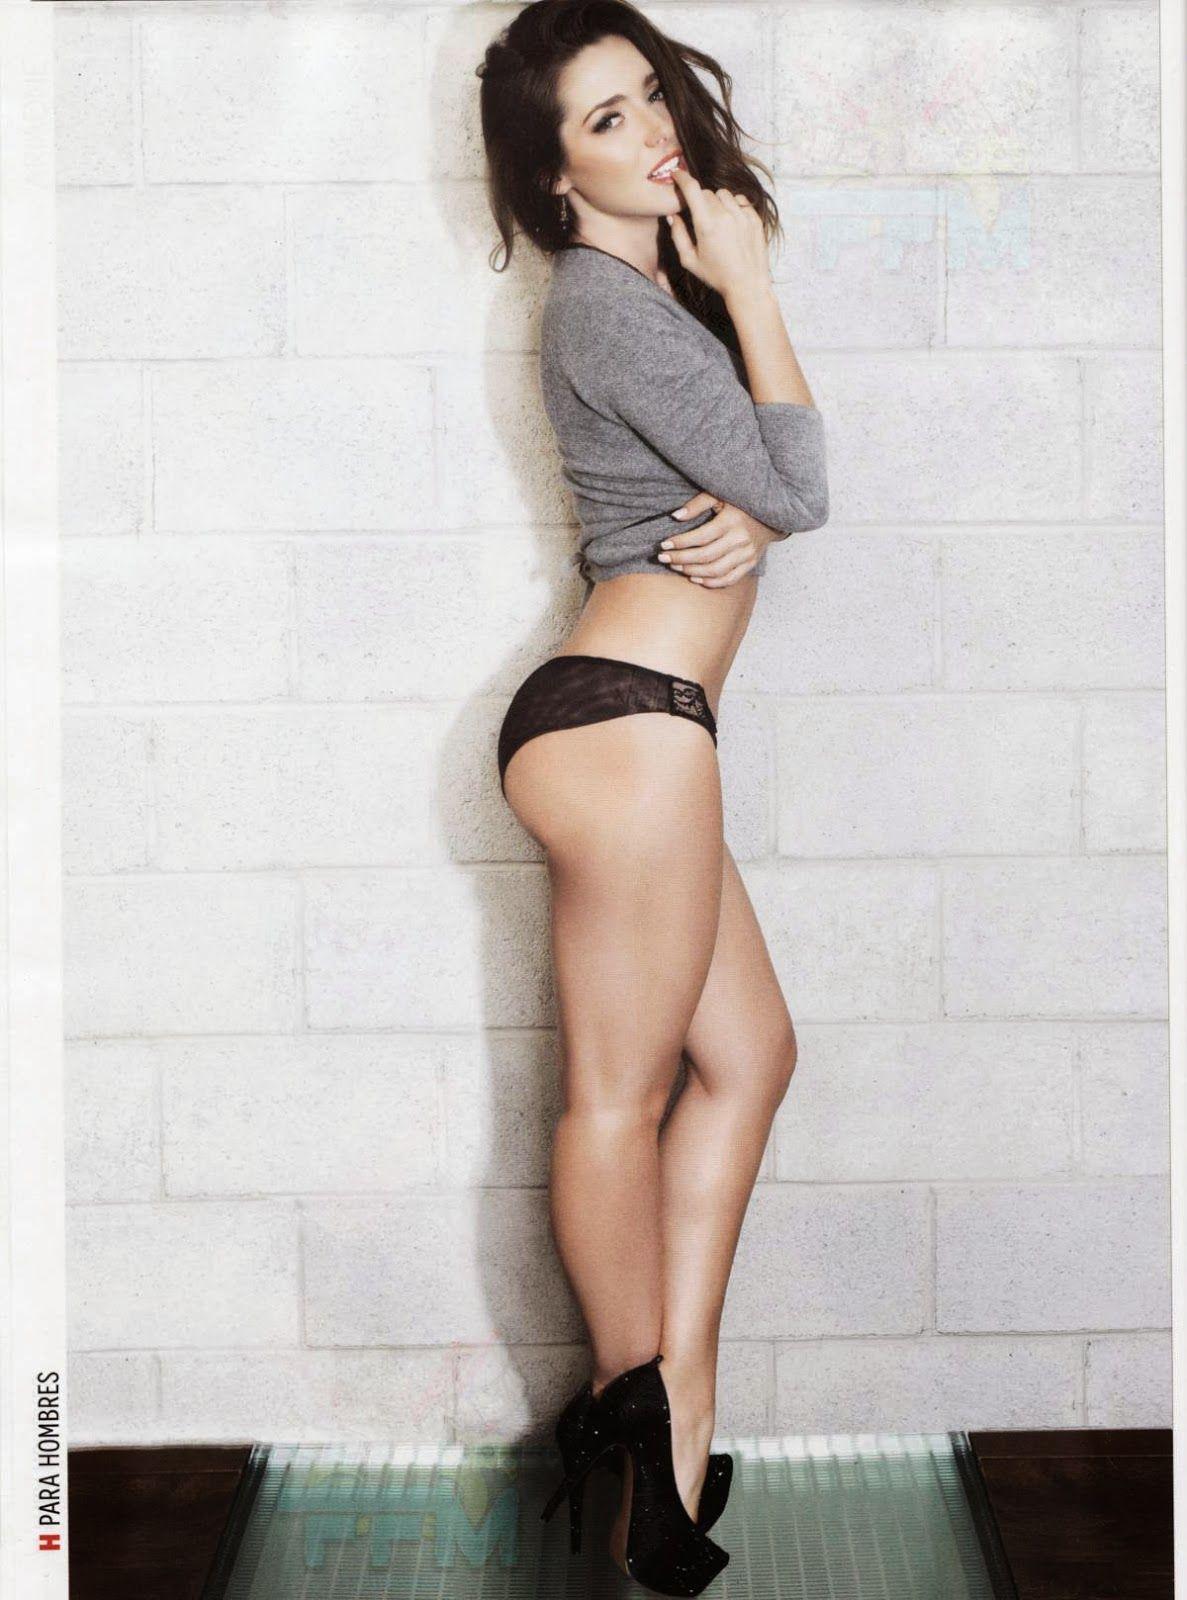 Hot Taylor Mega naked (38 photo), Ass, Sideboobs, Selfie, butt 2019